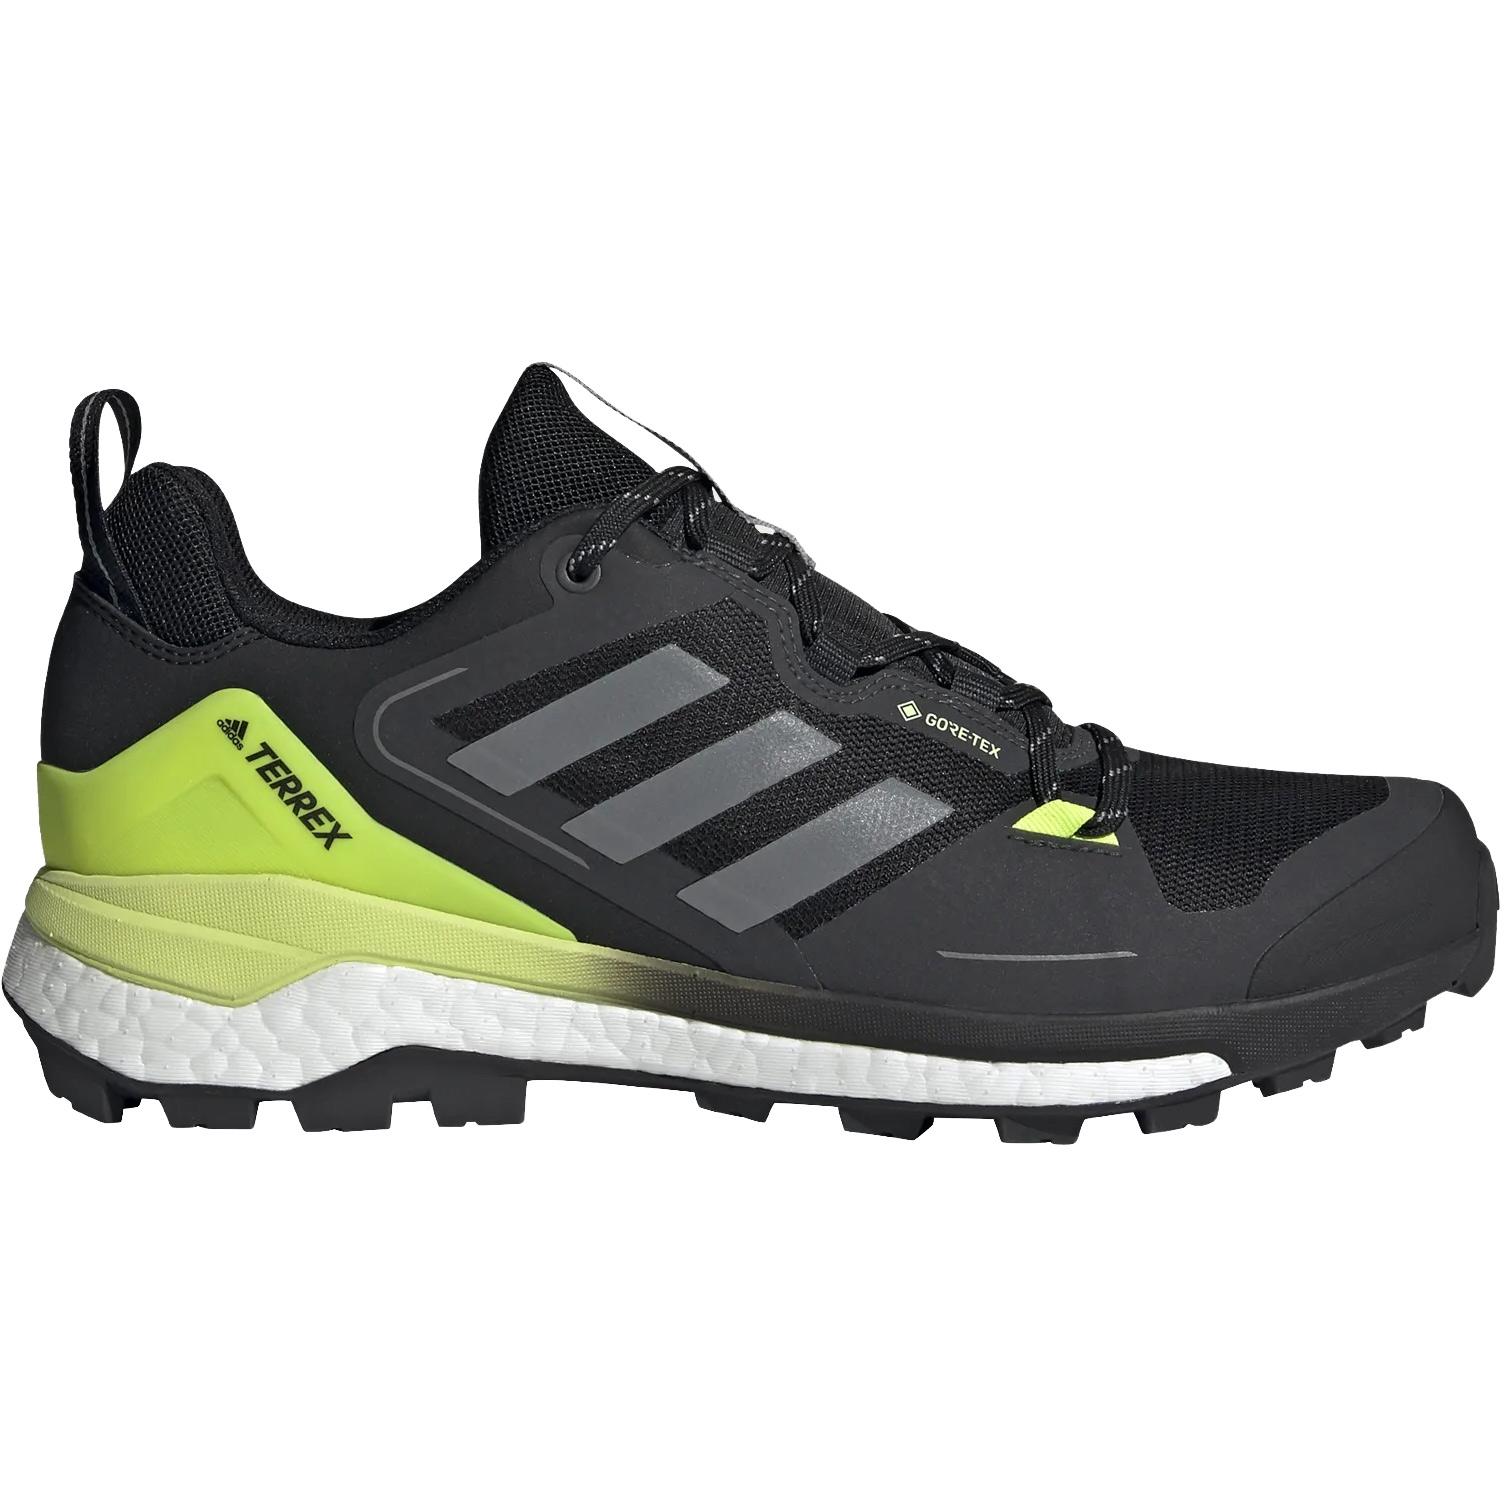 adidas Men's TERREX Skychaser GORE-TEX 2.0 Hiking Shoes - core black/grey three/solar yellow FW2932